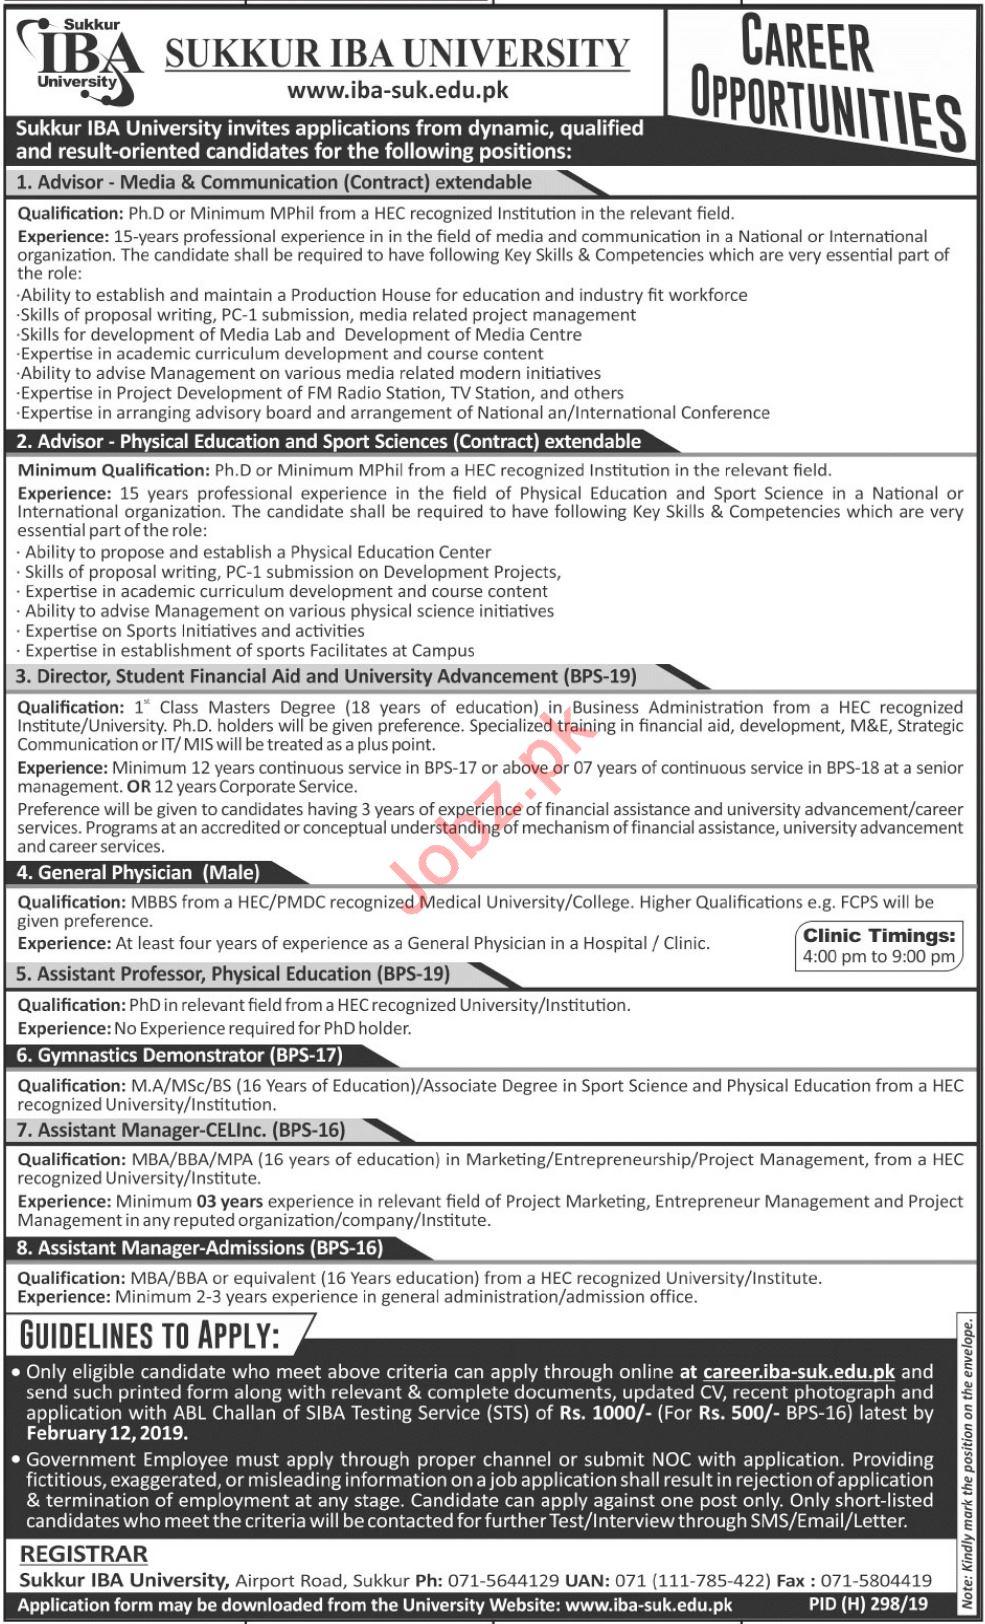 Sukkur IBA University Advisor Media and Communication Career